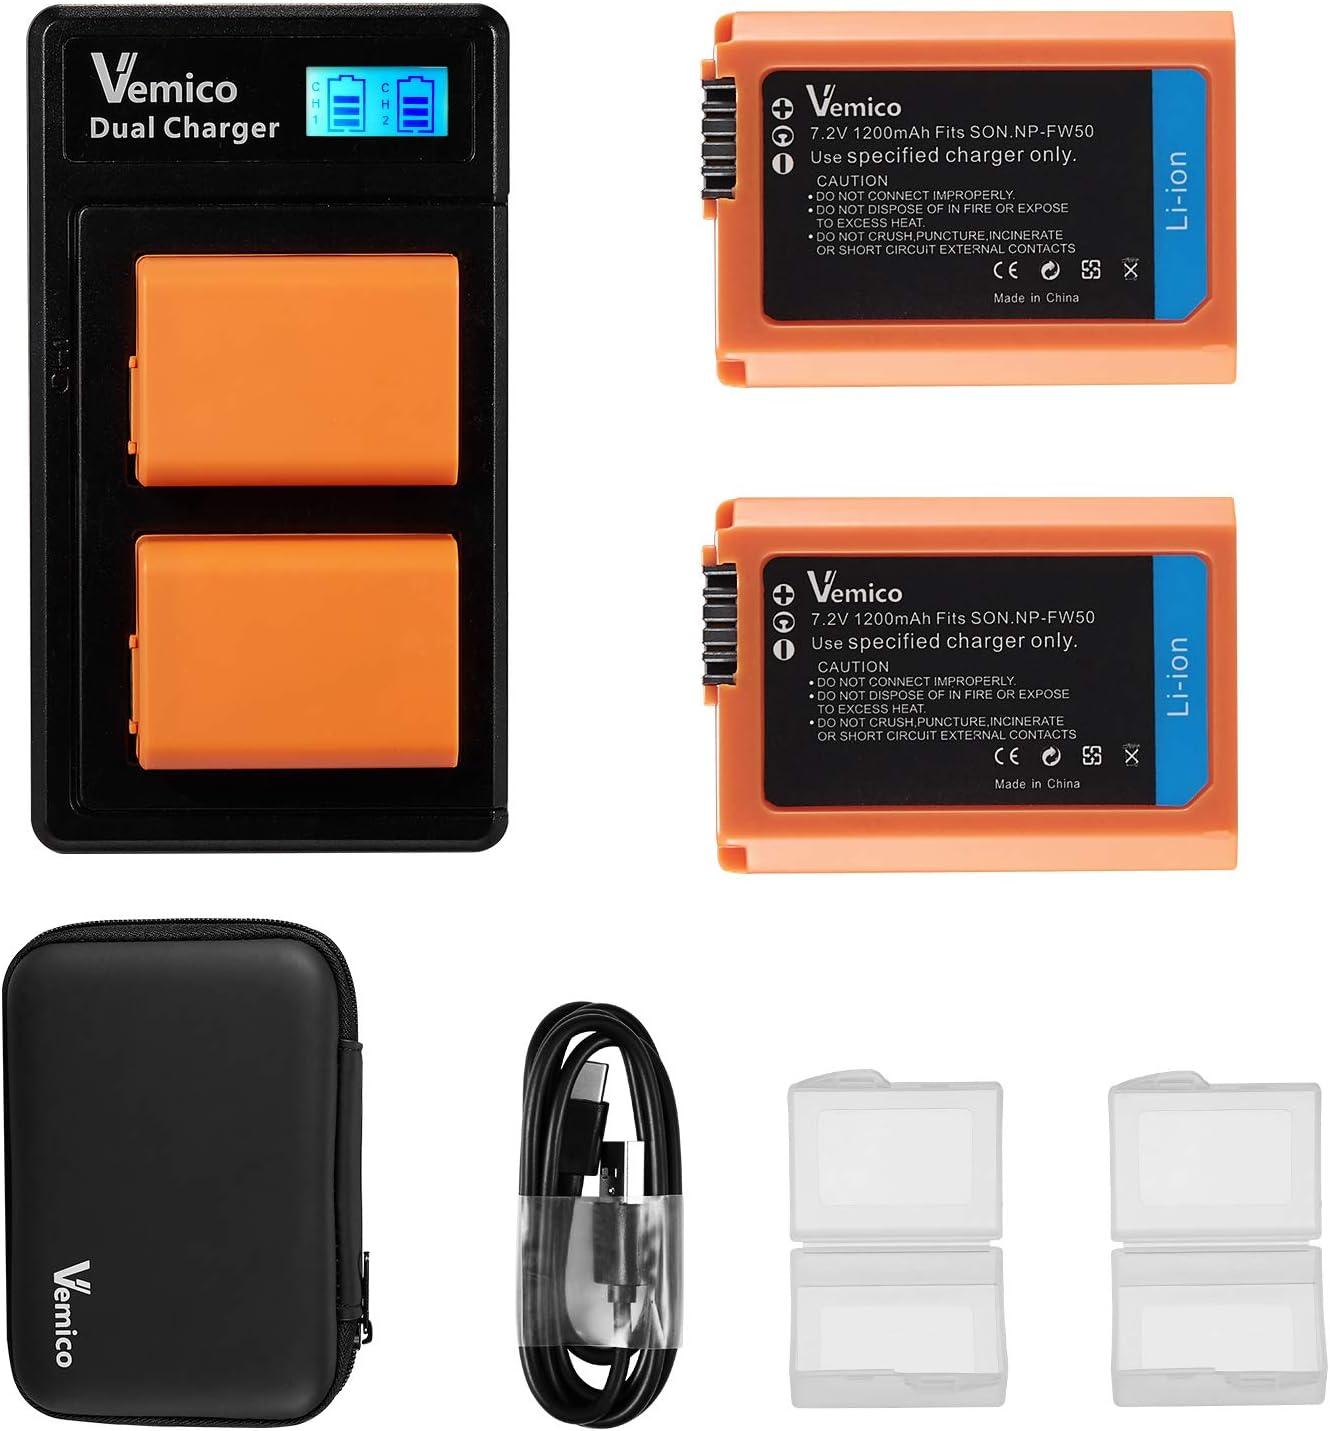 RAVPower NP-FW50 Akku Ladeger/ät Dual USB Charger f/ür Sony Alpha7 6300//6000 5100 NEX-7 NEX-6 NEX-F3 NEX-3 Nex-5 NEX-5N NEX-5T SLT A55V A33 A35 A37 usw. 6500//6400 7ii